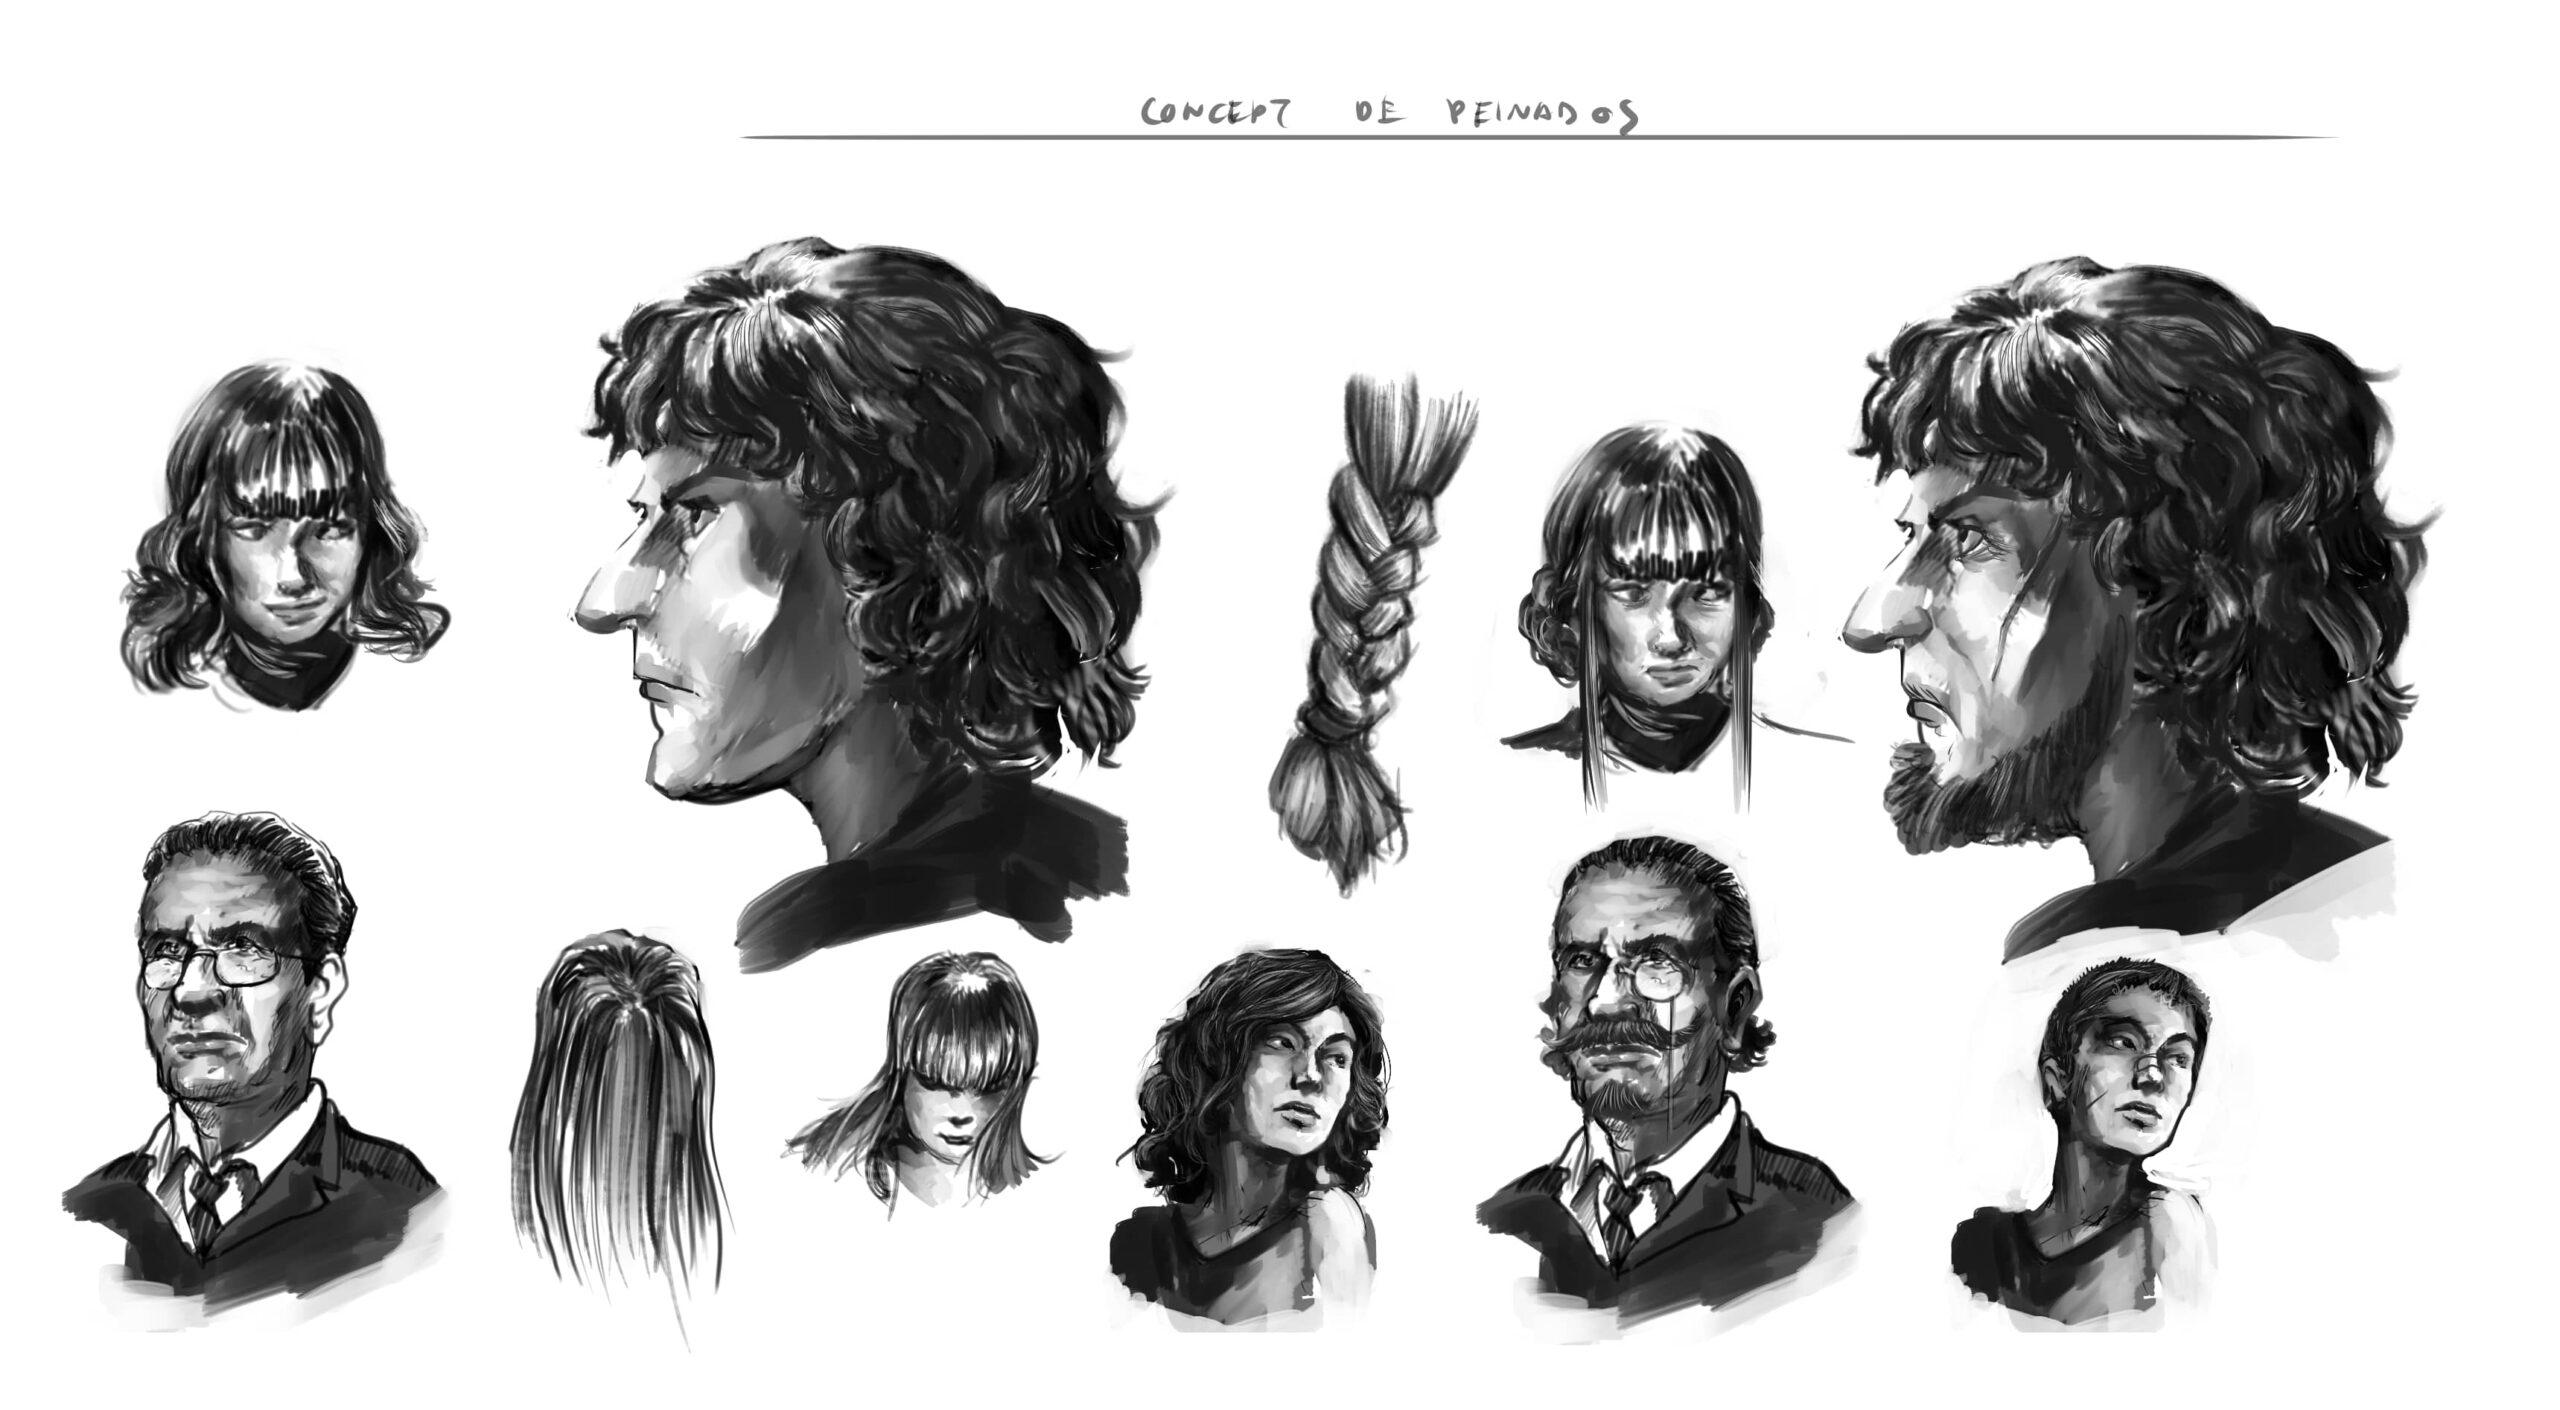 pelo personajes concept art